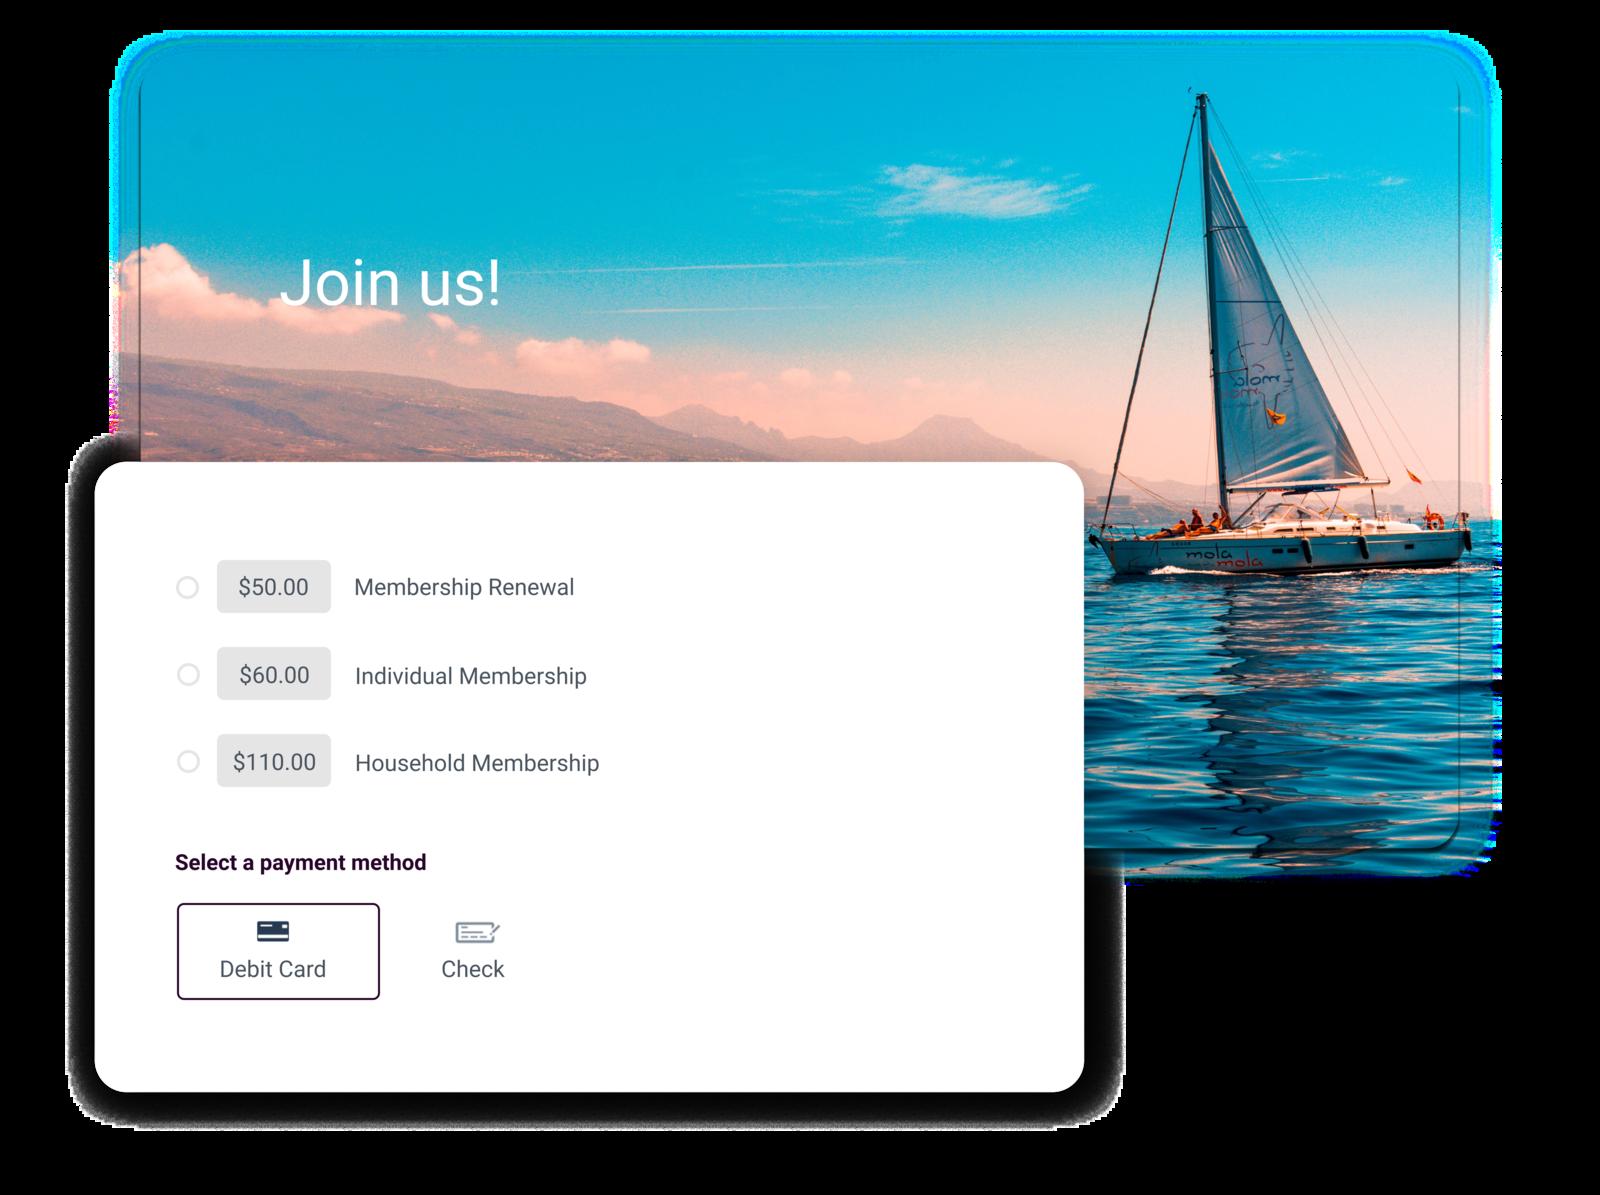 sailing club management software summary